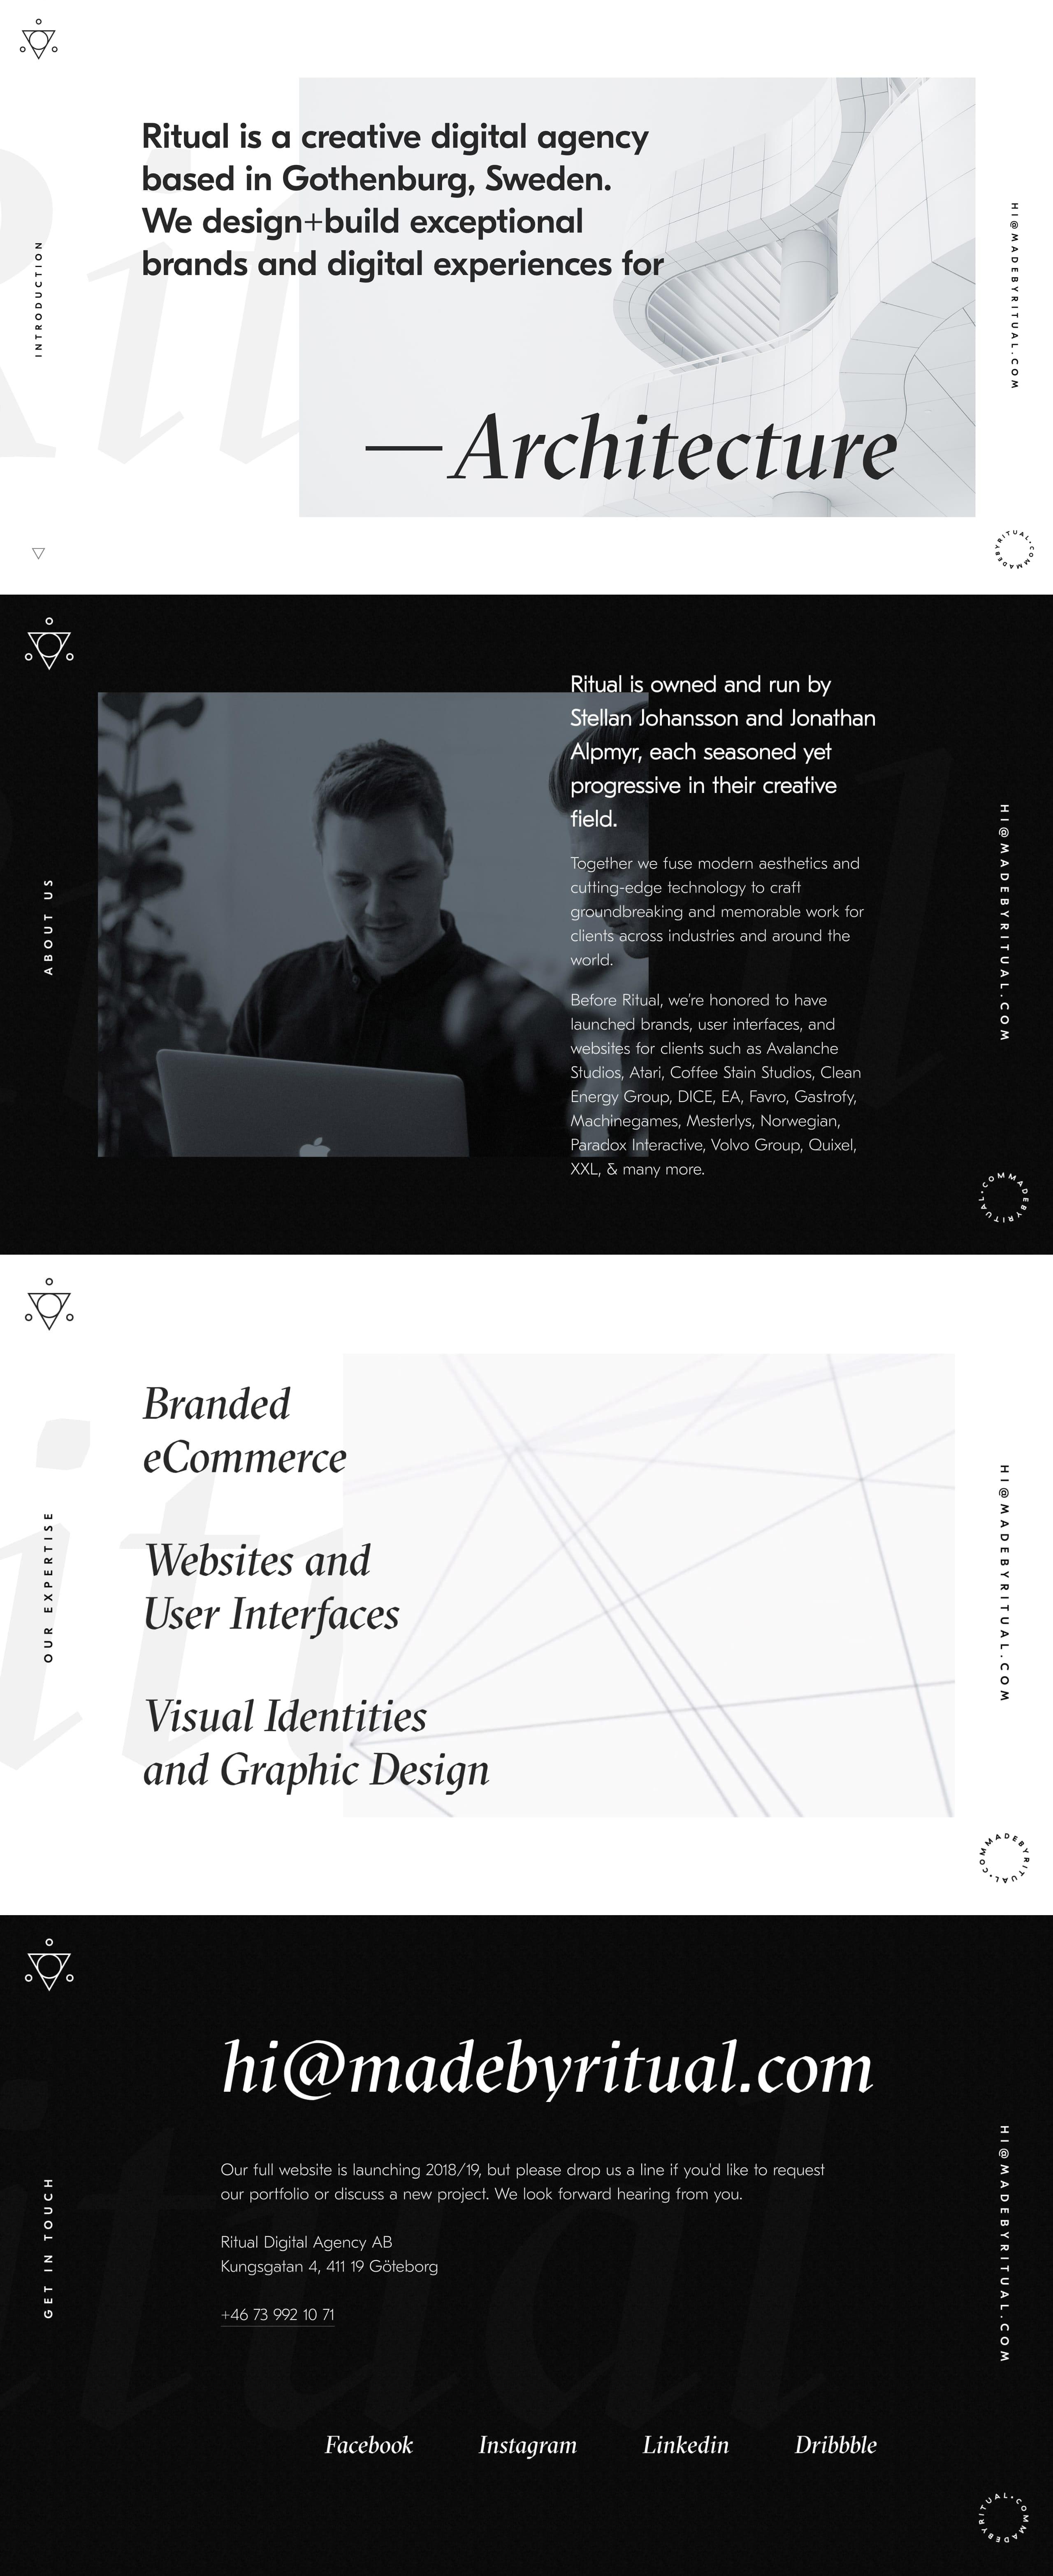 Ritual Website Screenshot